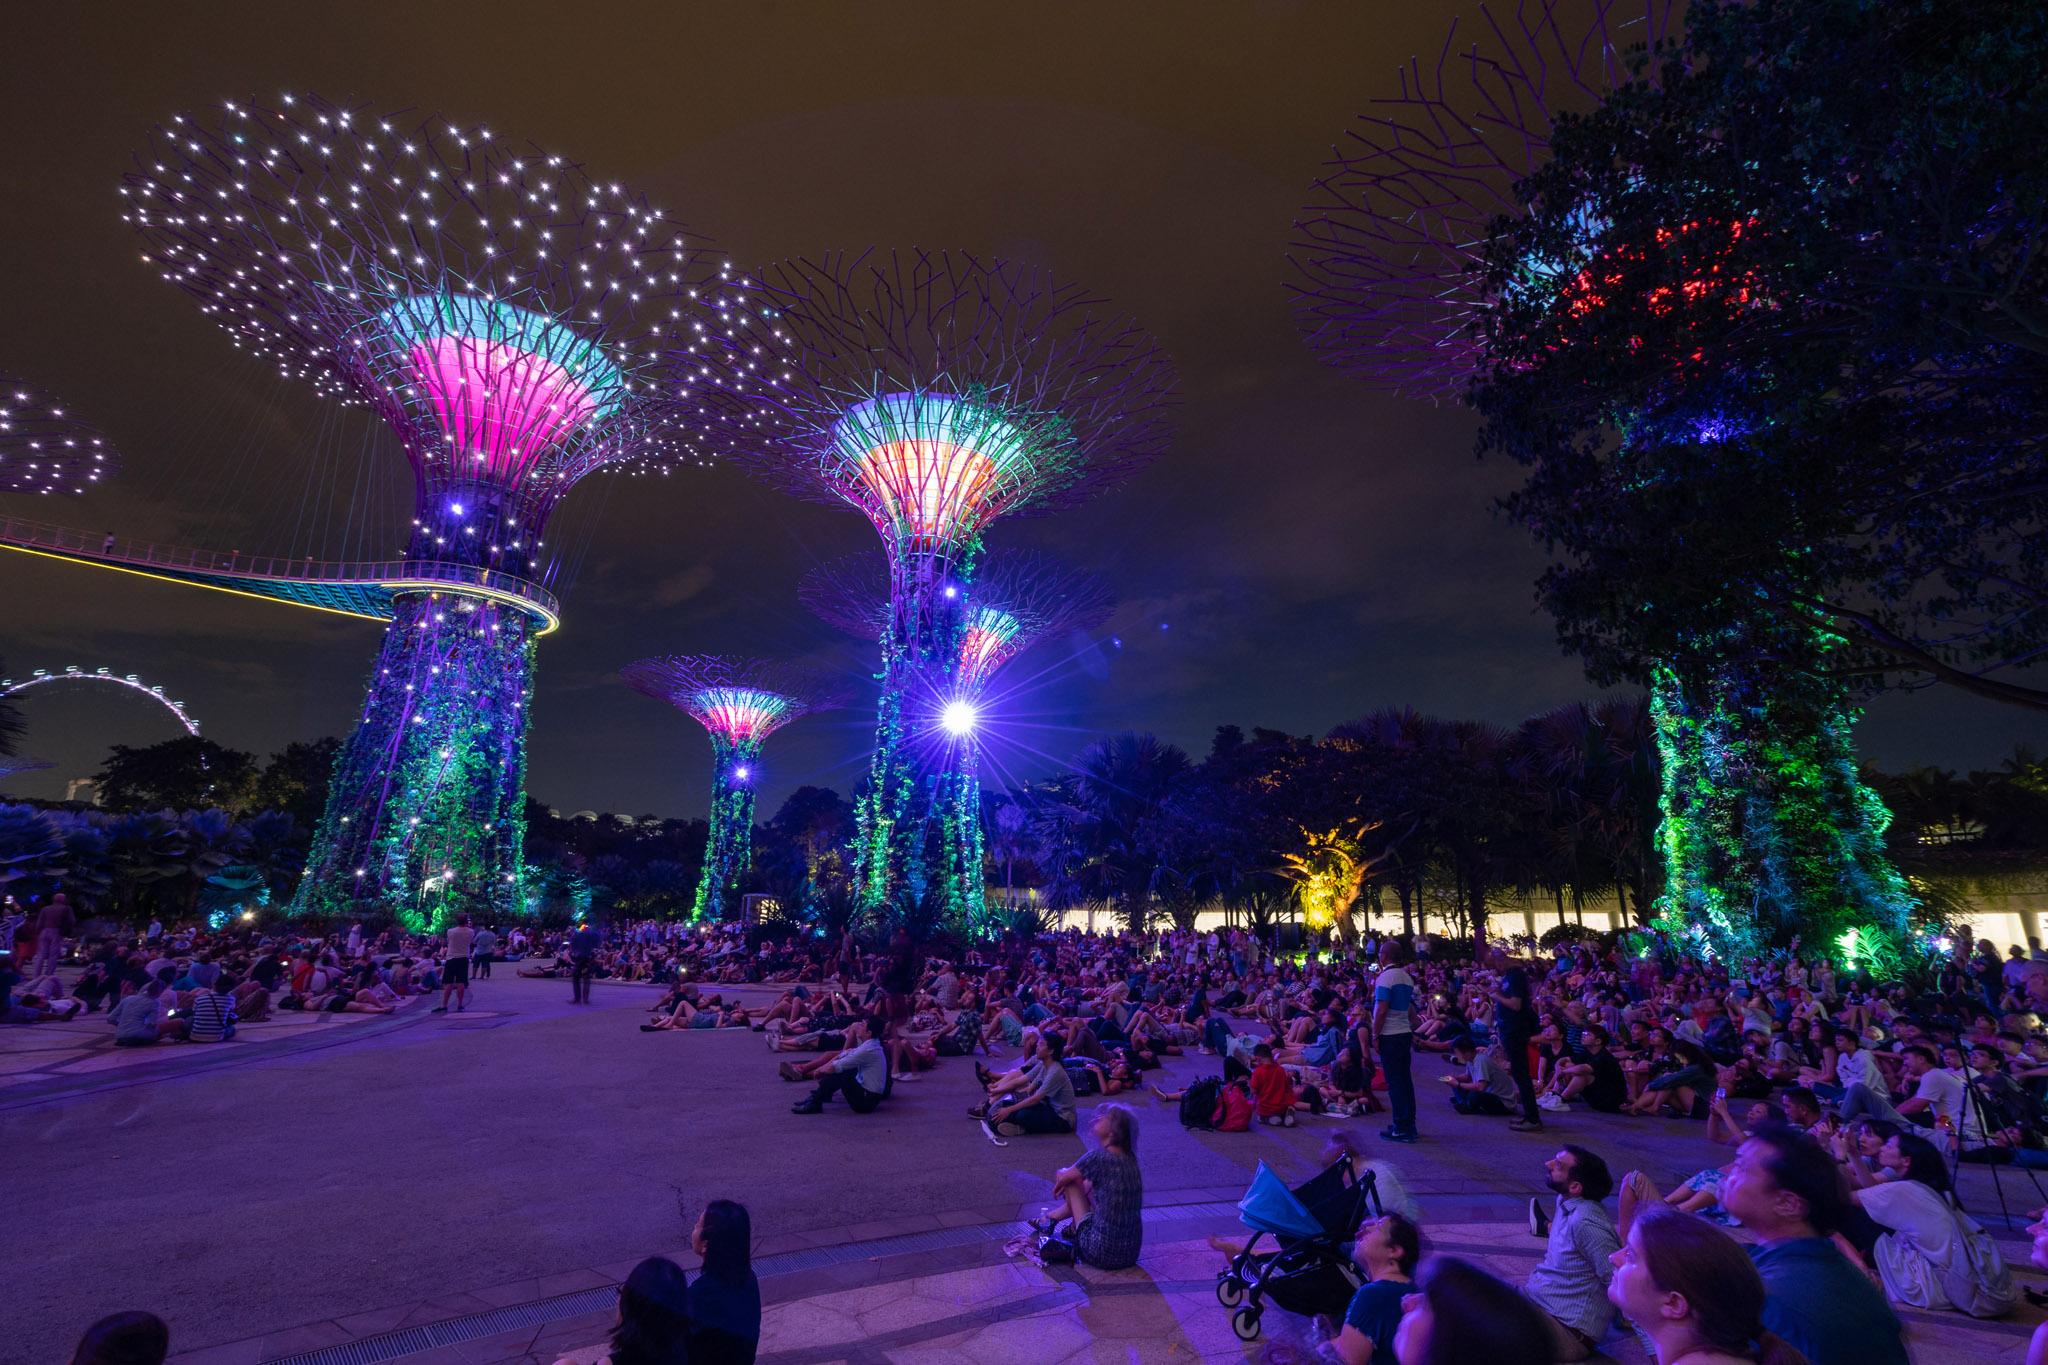 viator-singapore-photographer-tourism-tours-zoo-little-india-gardens-marina-bay-017.jpg